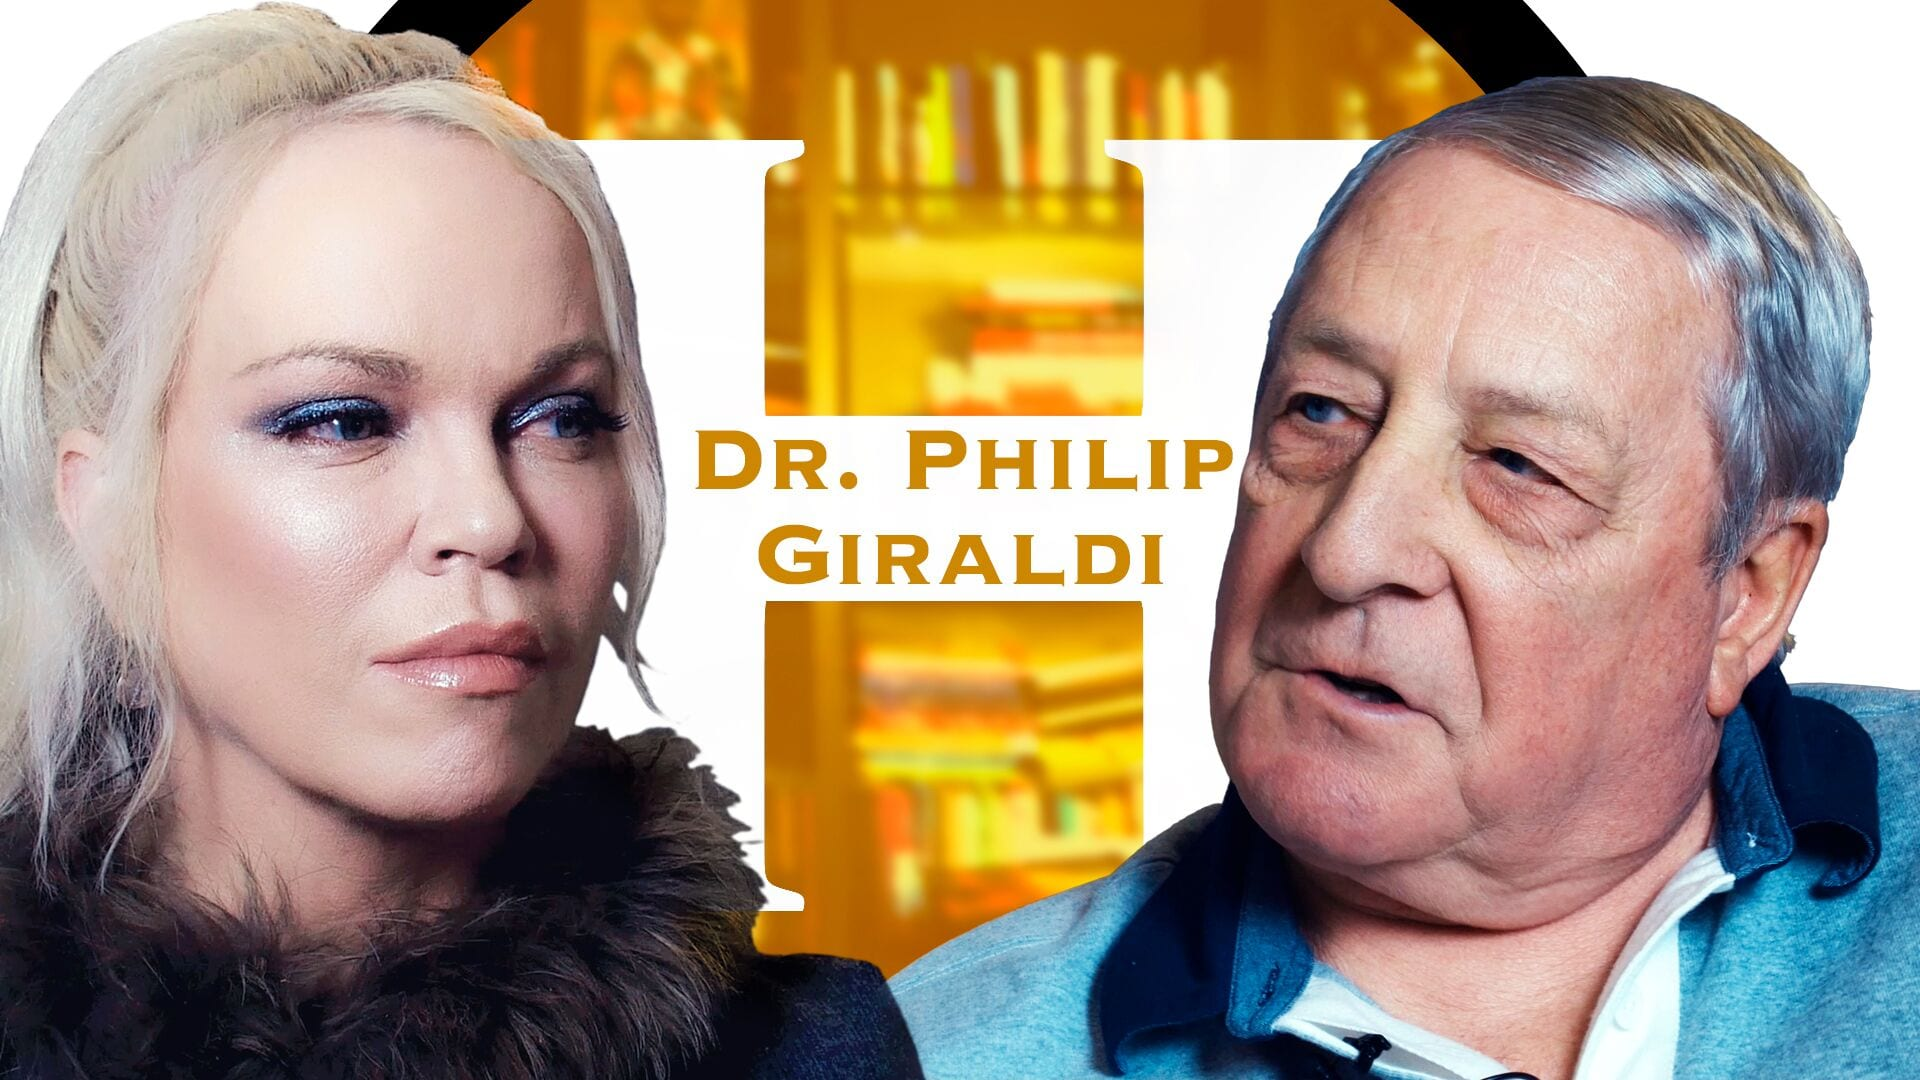 Phil Giraldi Hanne Nabintu Herland Report